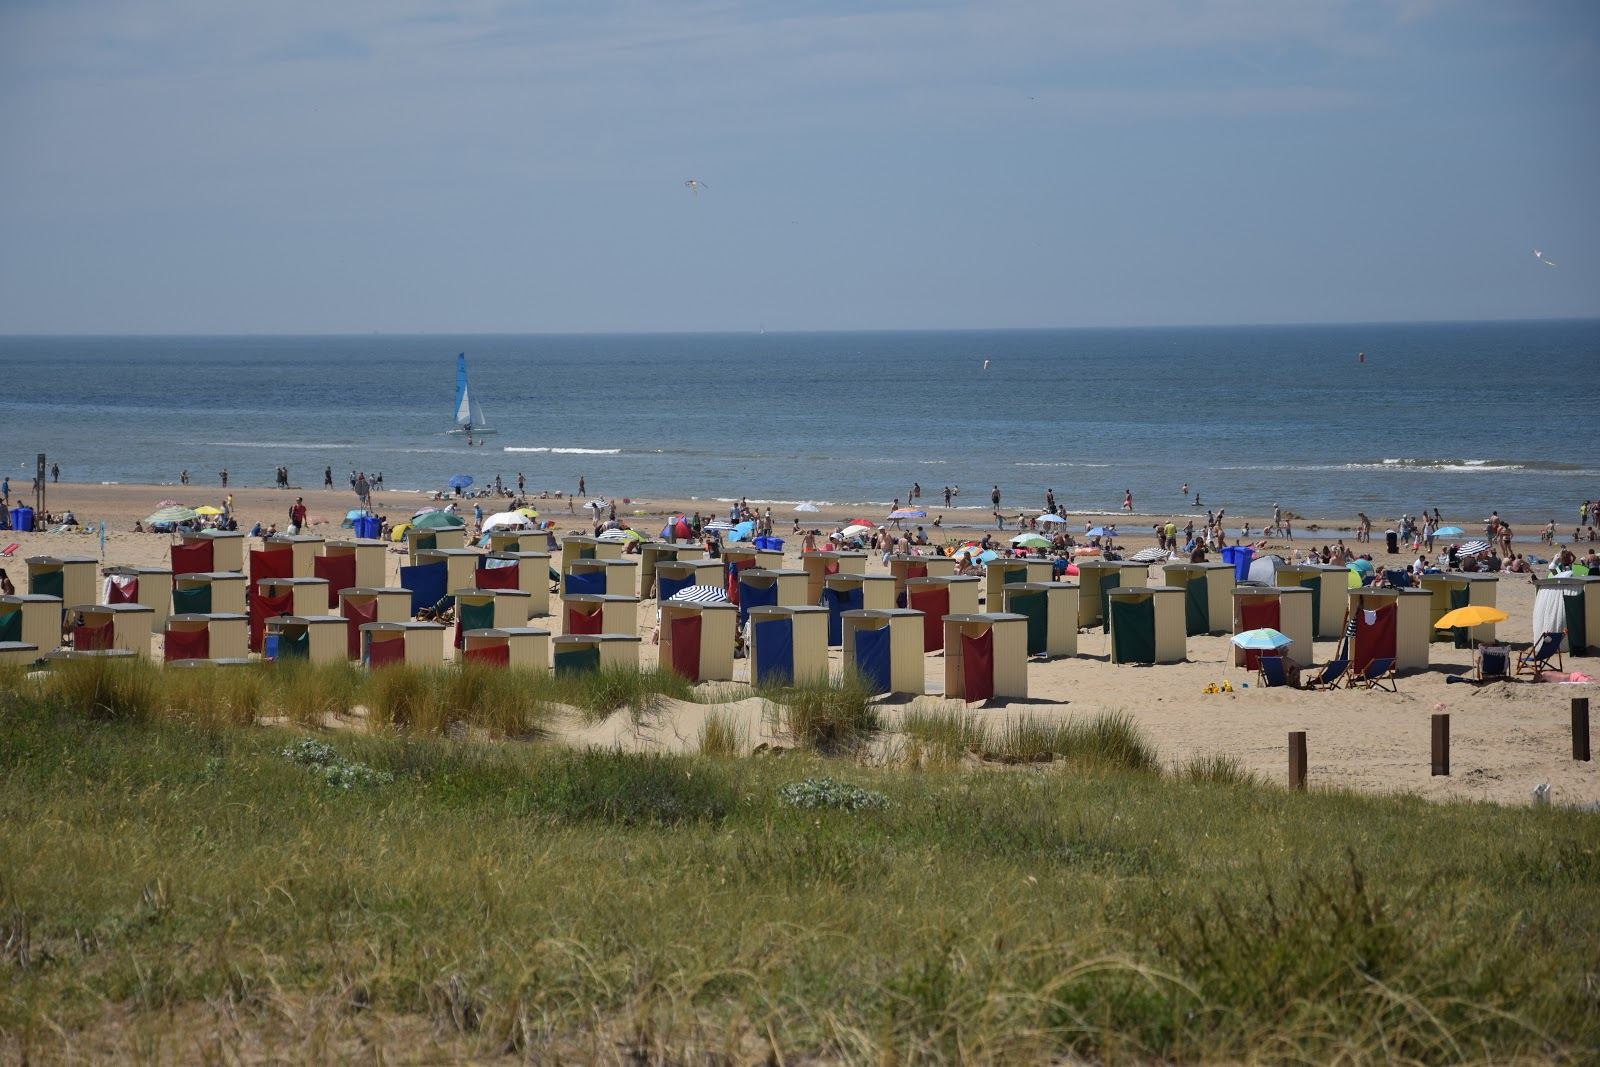 Holandia Katwijk plaża